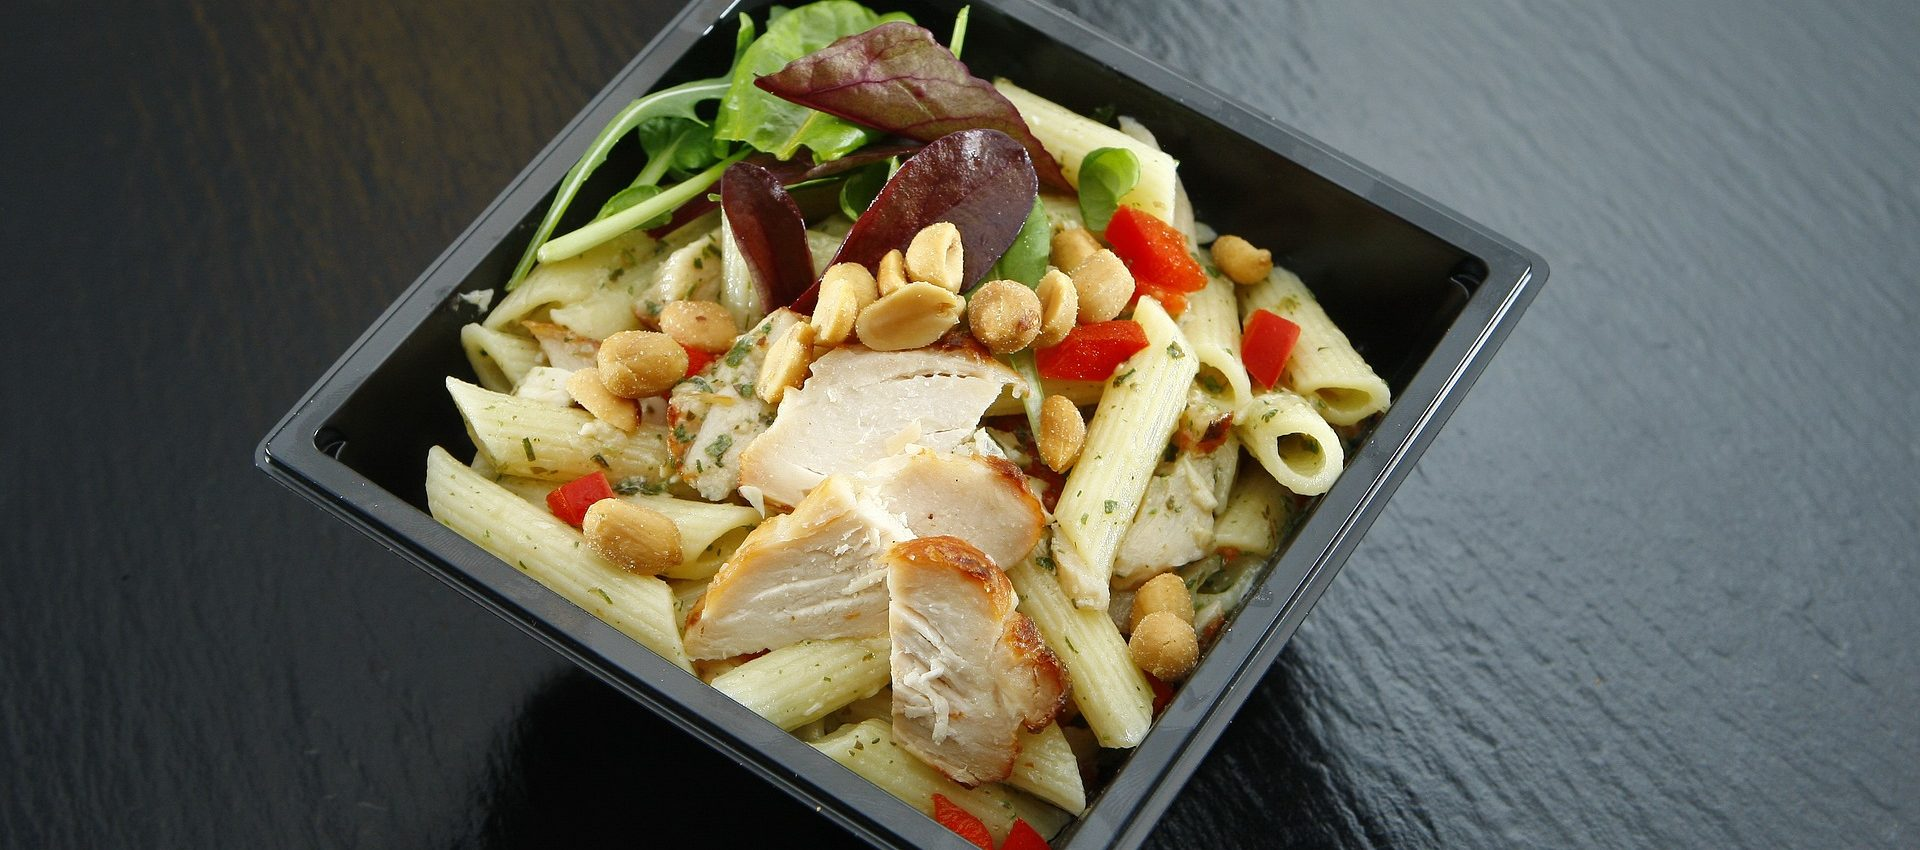 Salade de pâtes cacahuète poulet au cookeo